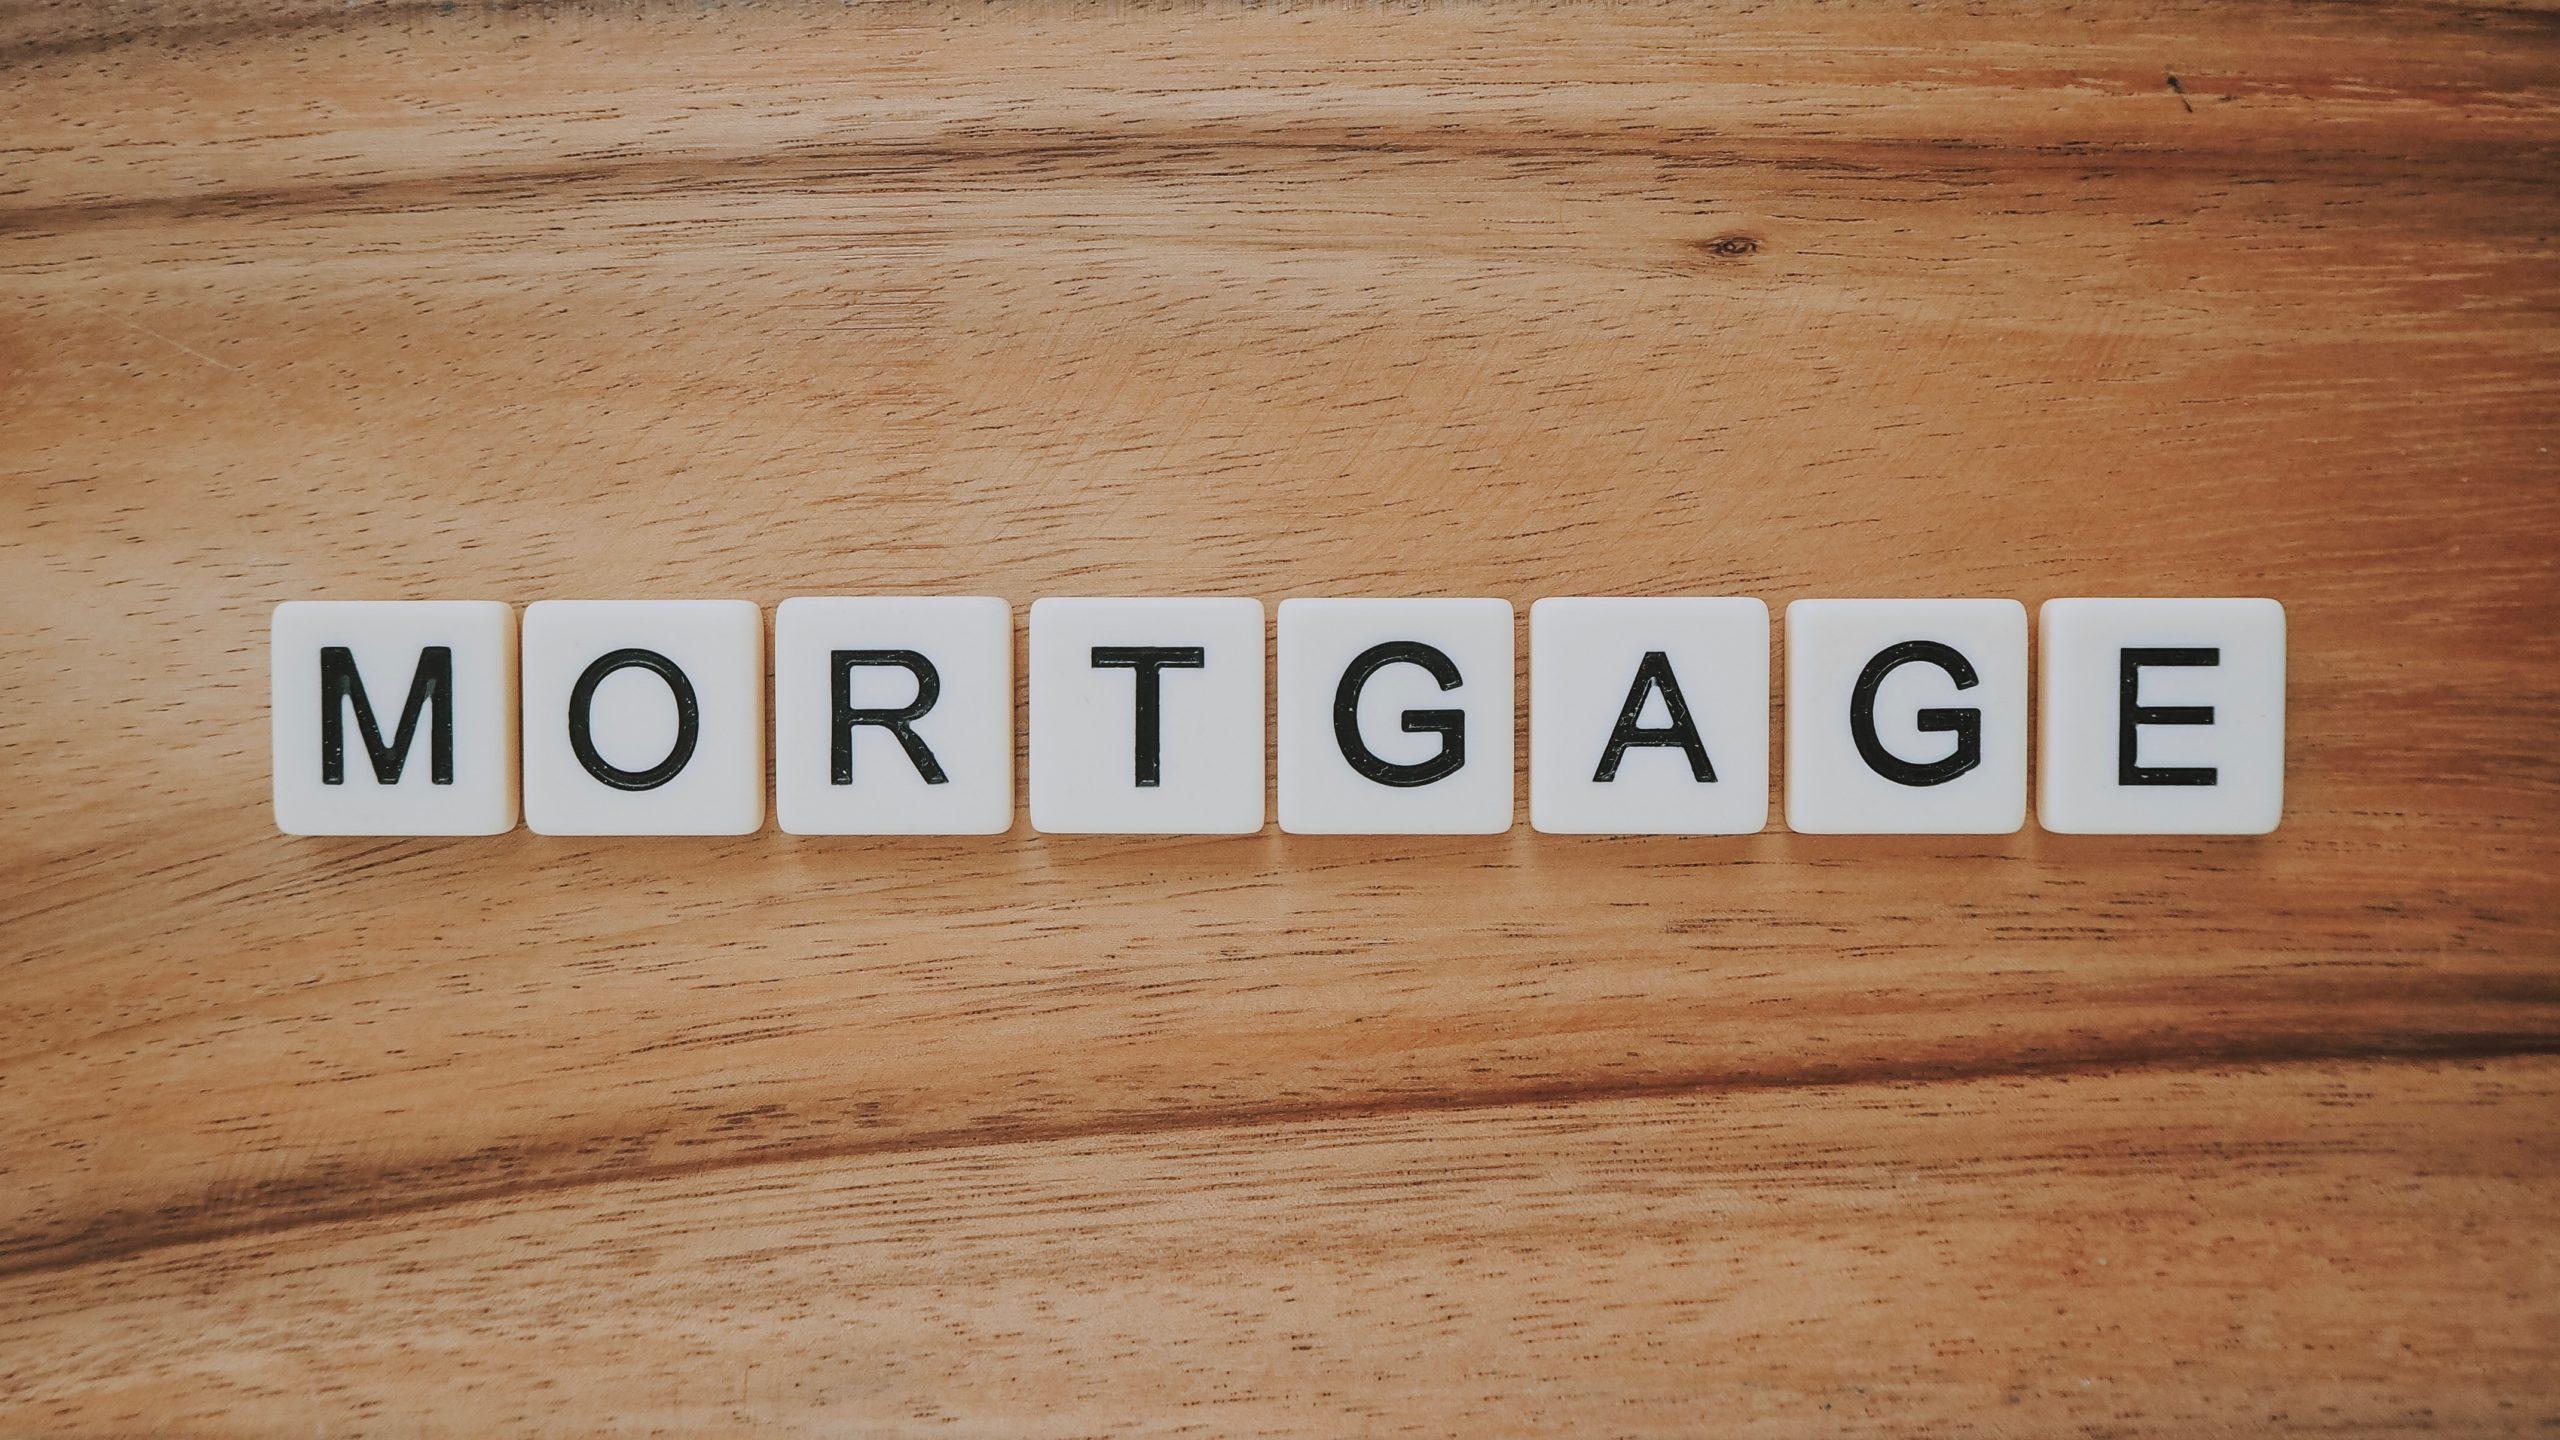 Mortgage quiz (5 minutes)